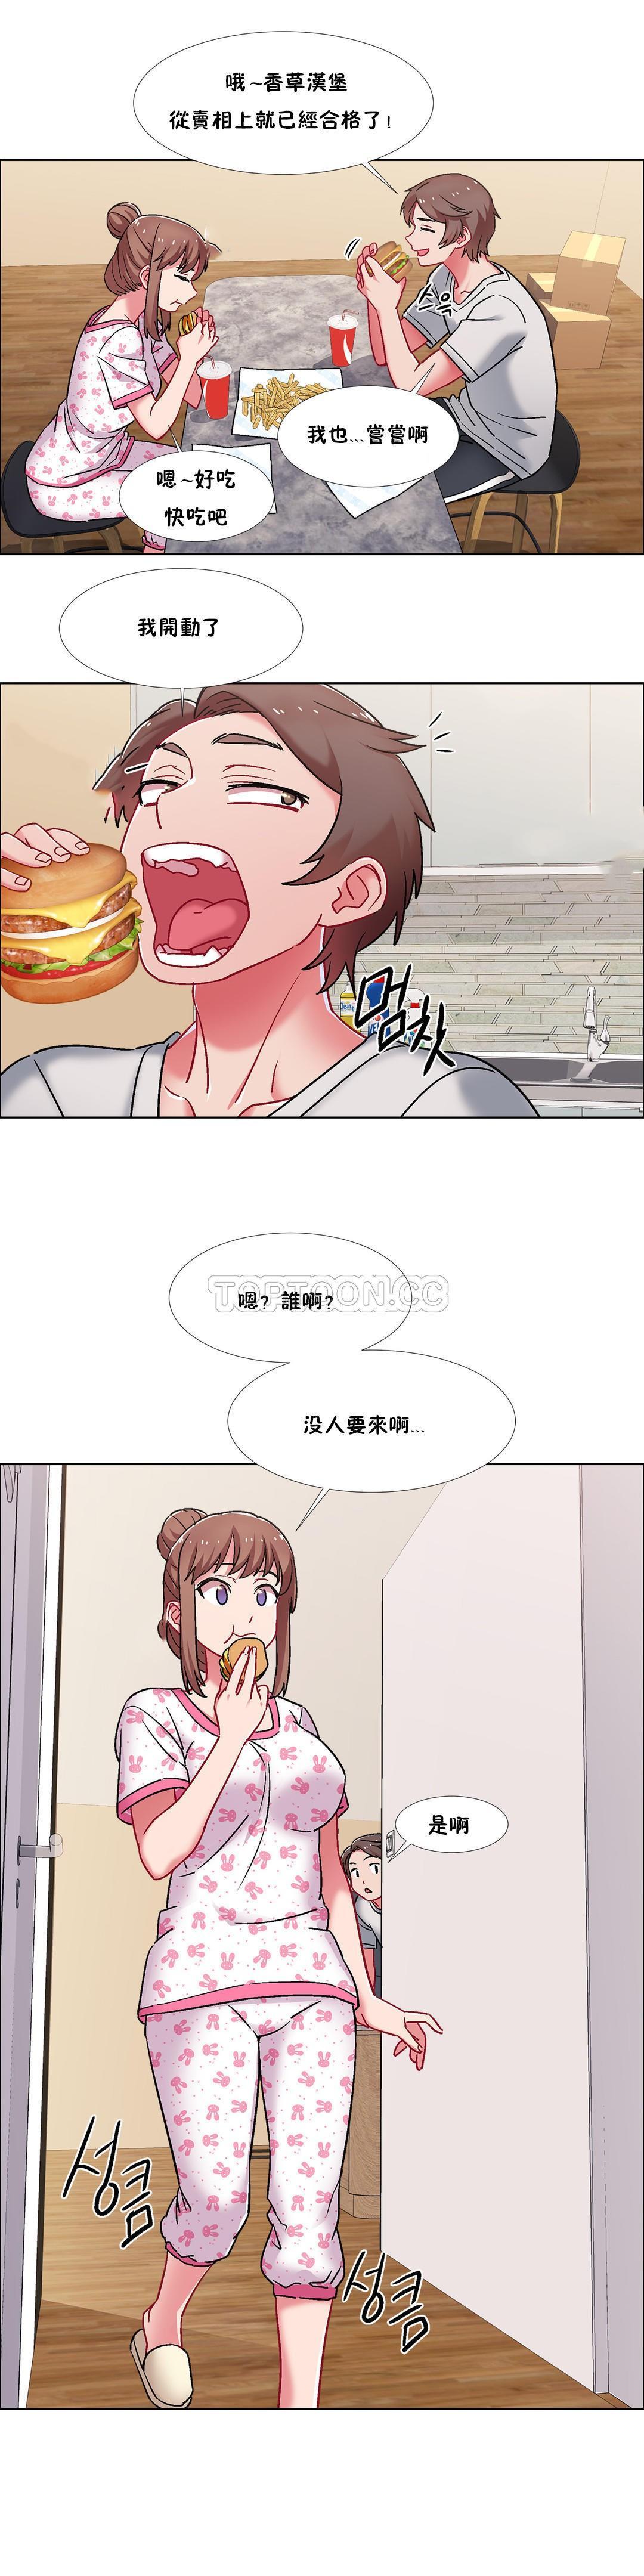 [Studio Wannabe] Rental Girls | 出租女郎 Ch. 33-58 [Chinese]  第二季 完结 240